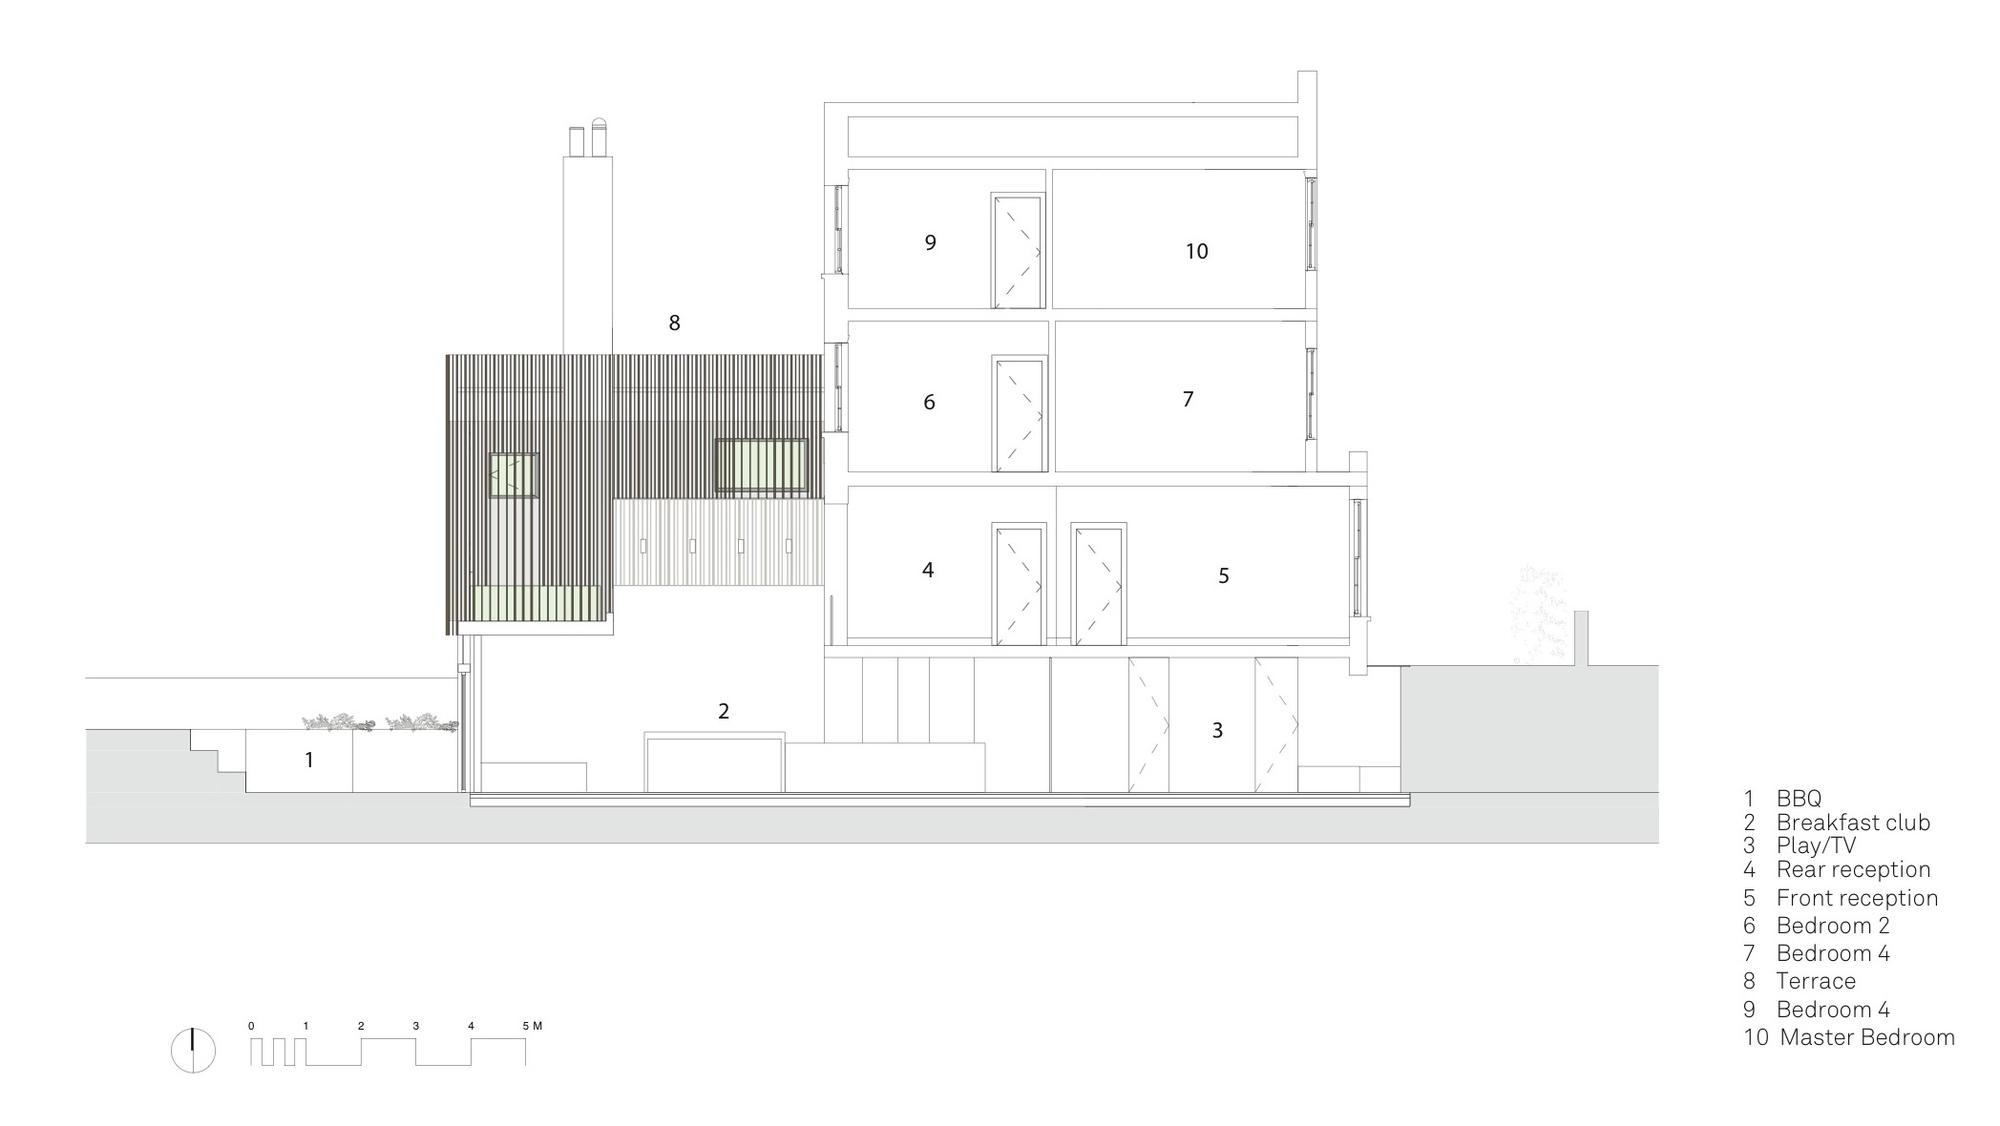 51d25bedb3fc4beae10000a2_power-house-paul-archer-design_section